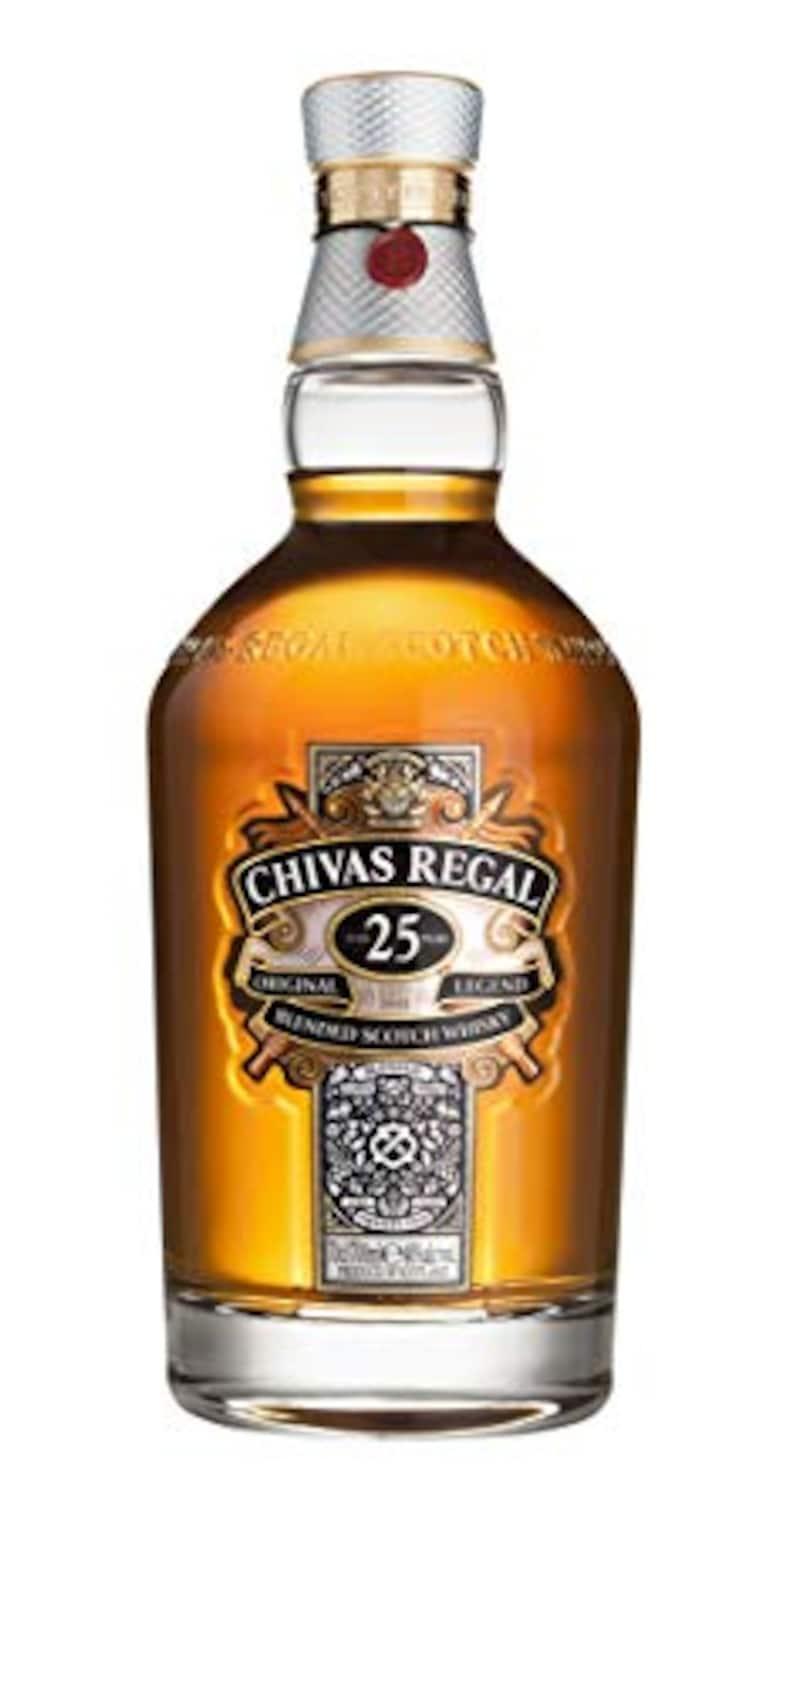 Chivas Regal (シーバスリーガル),シーバスリーガル 25年